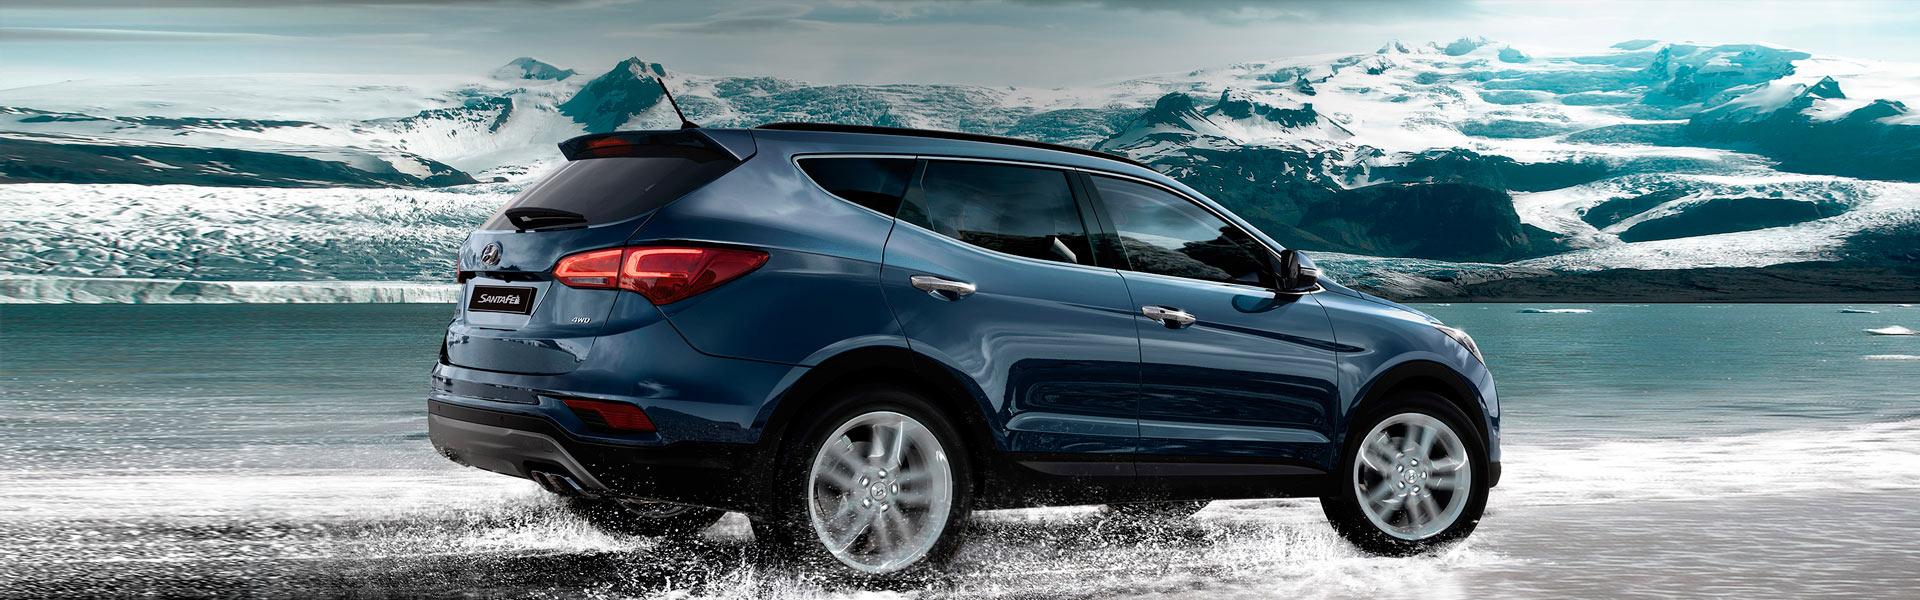 ТО Hyundai Santa Fe